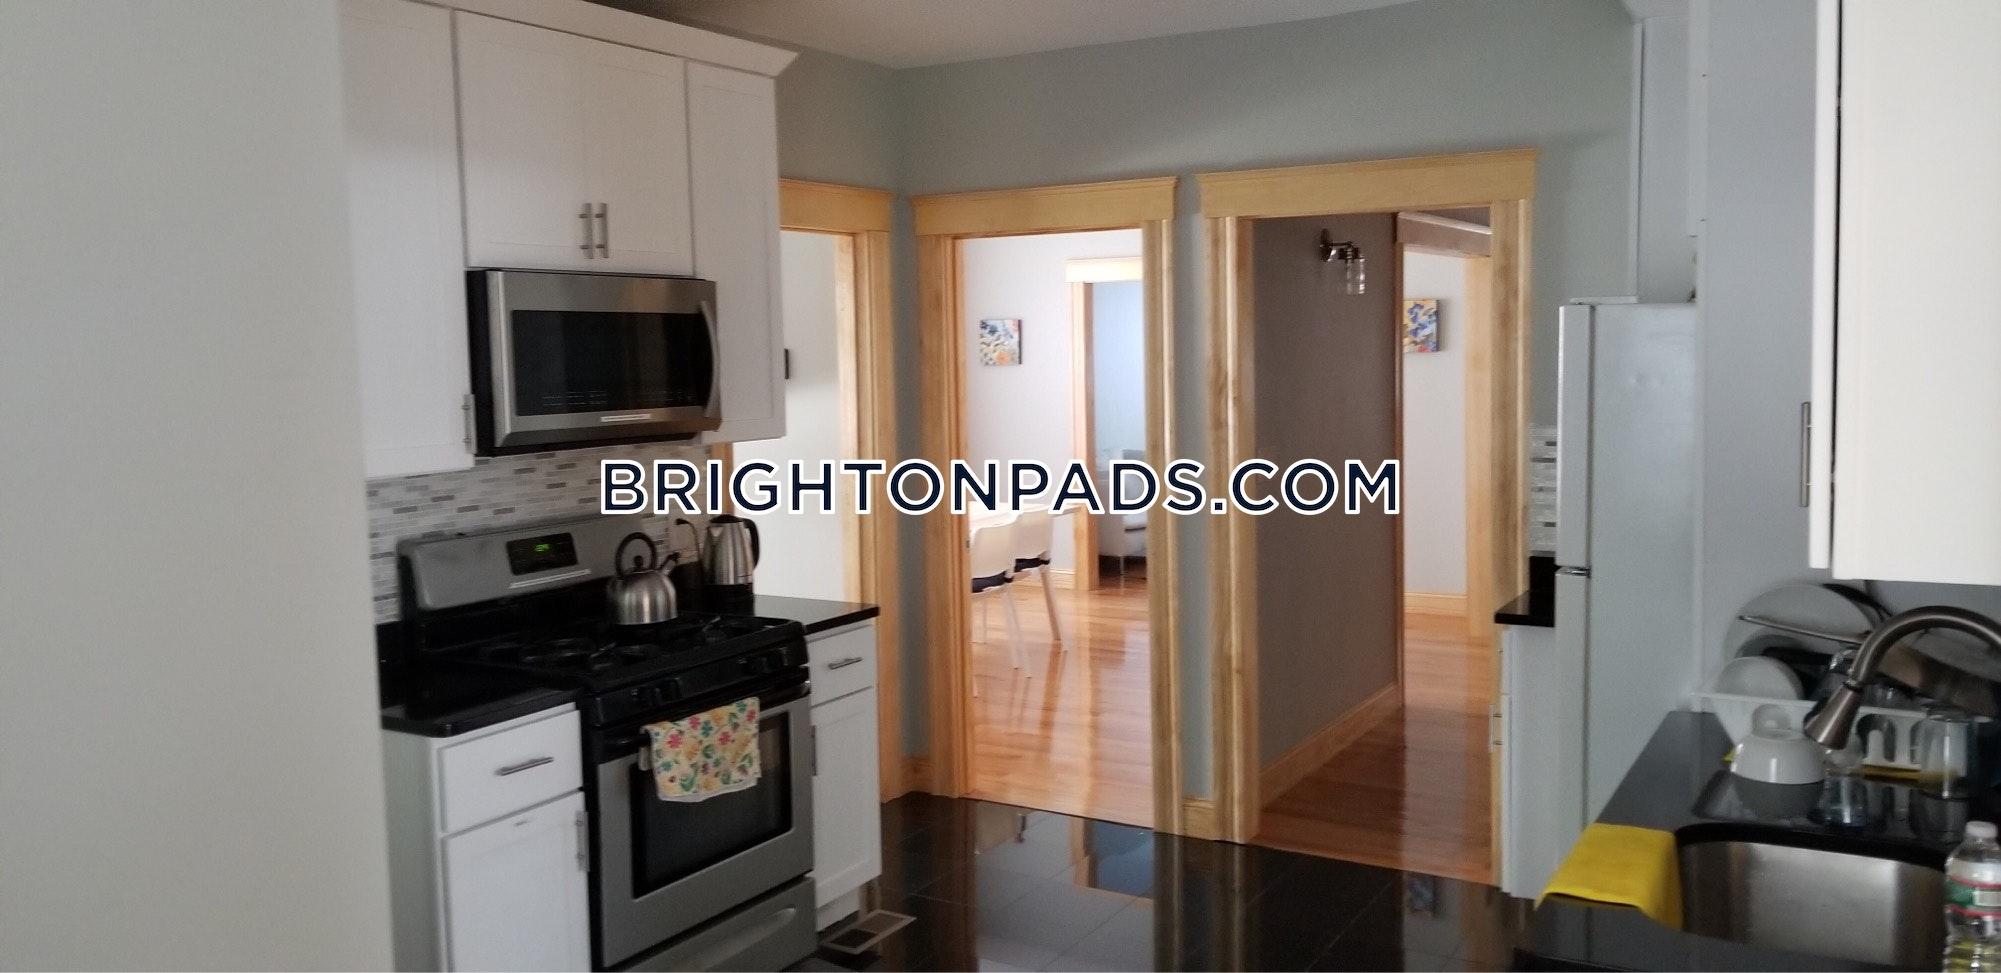 brighton-apartment-for-rent-6-bedrooms-6-baths-boston-9000-428051